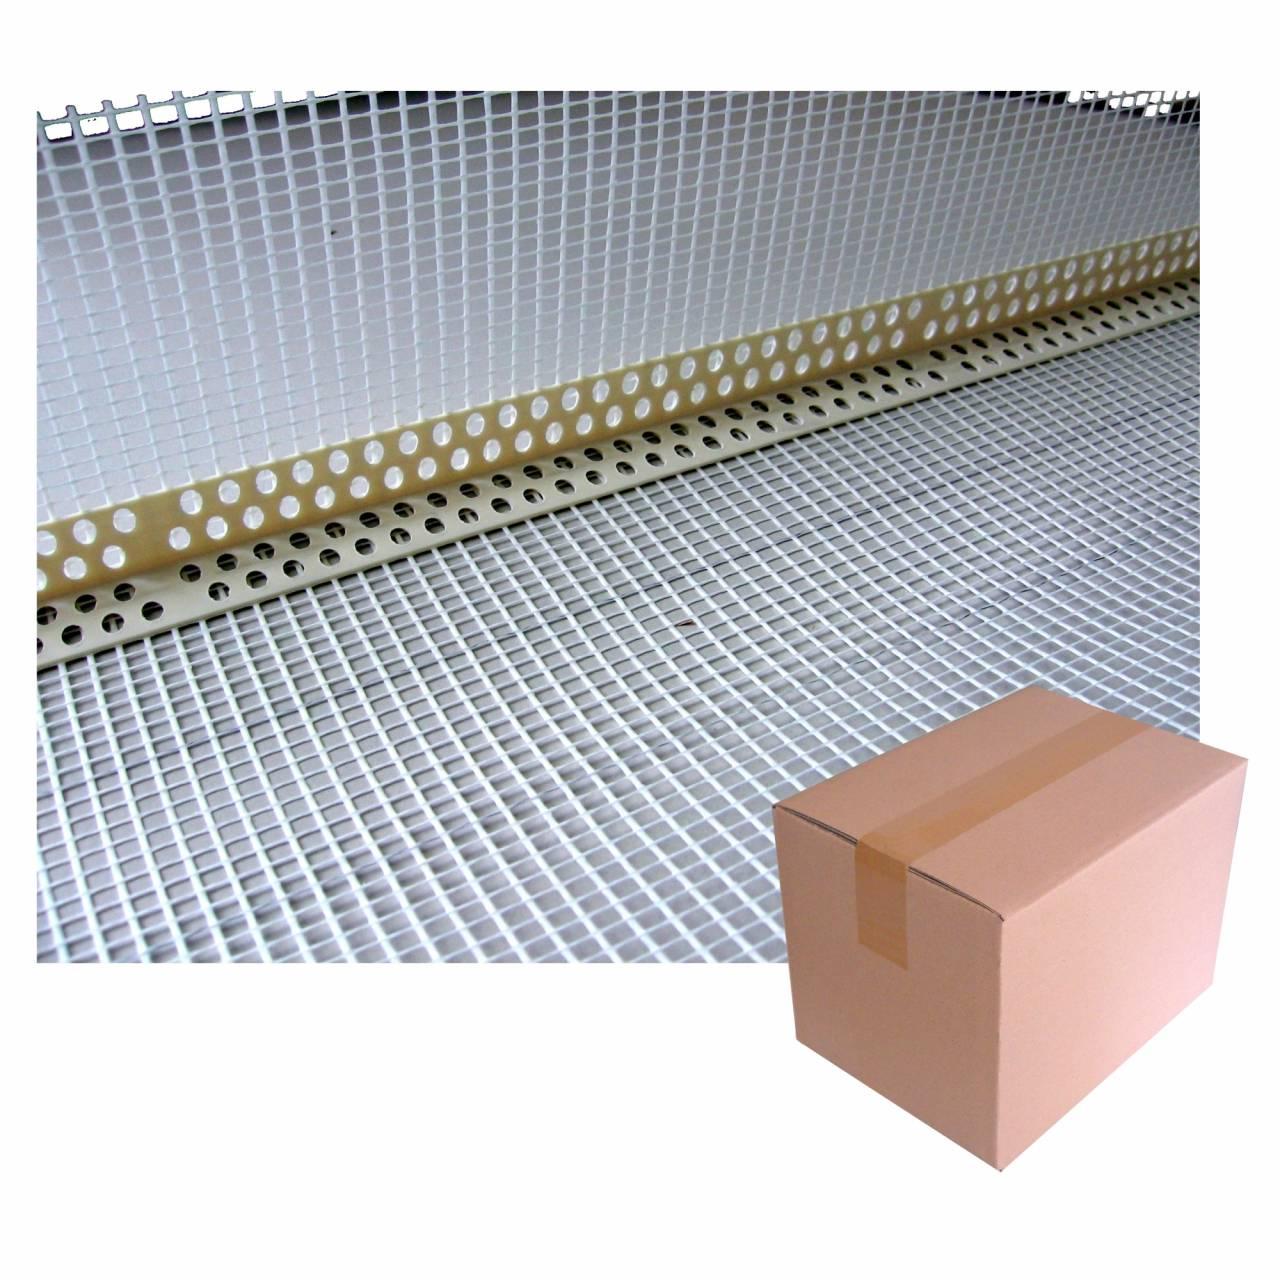 PVC-Eckwinkel 2,5 m, 80x120 Gewebe weiss / Krt a 250 lfm